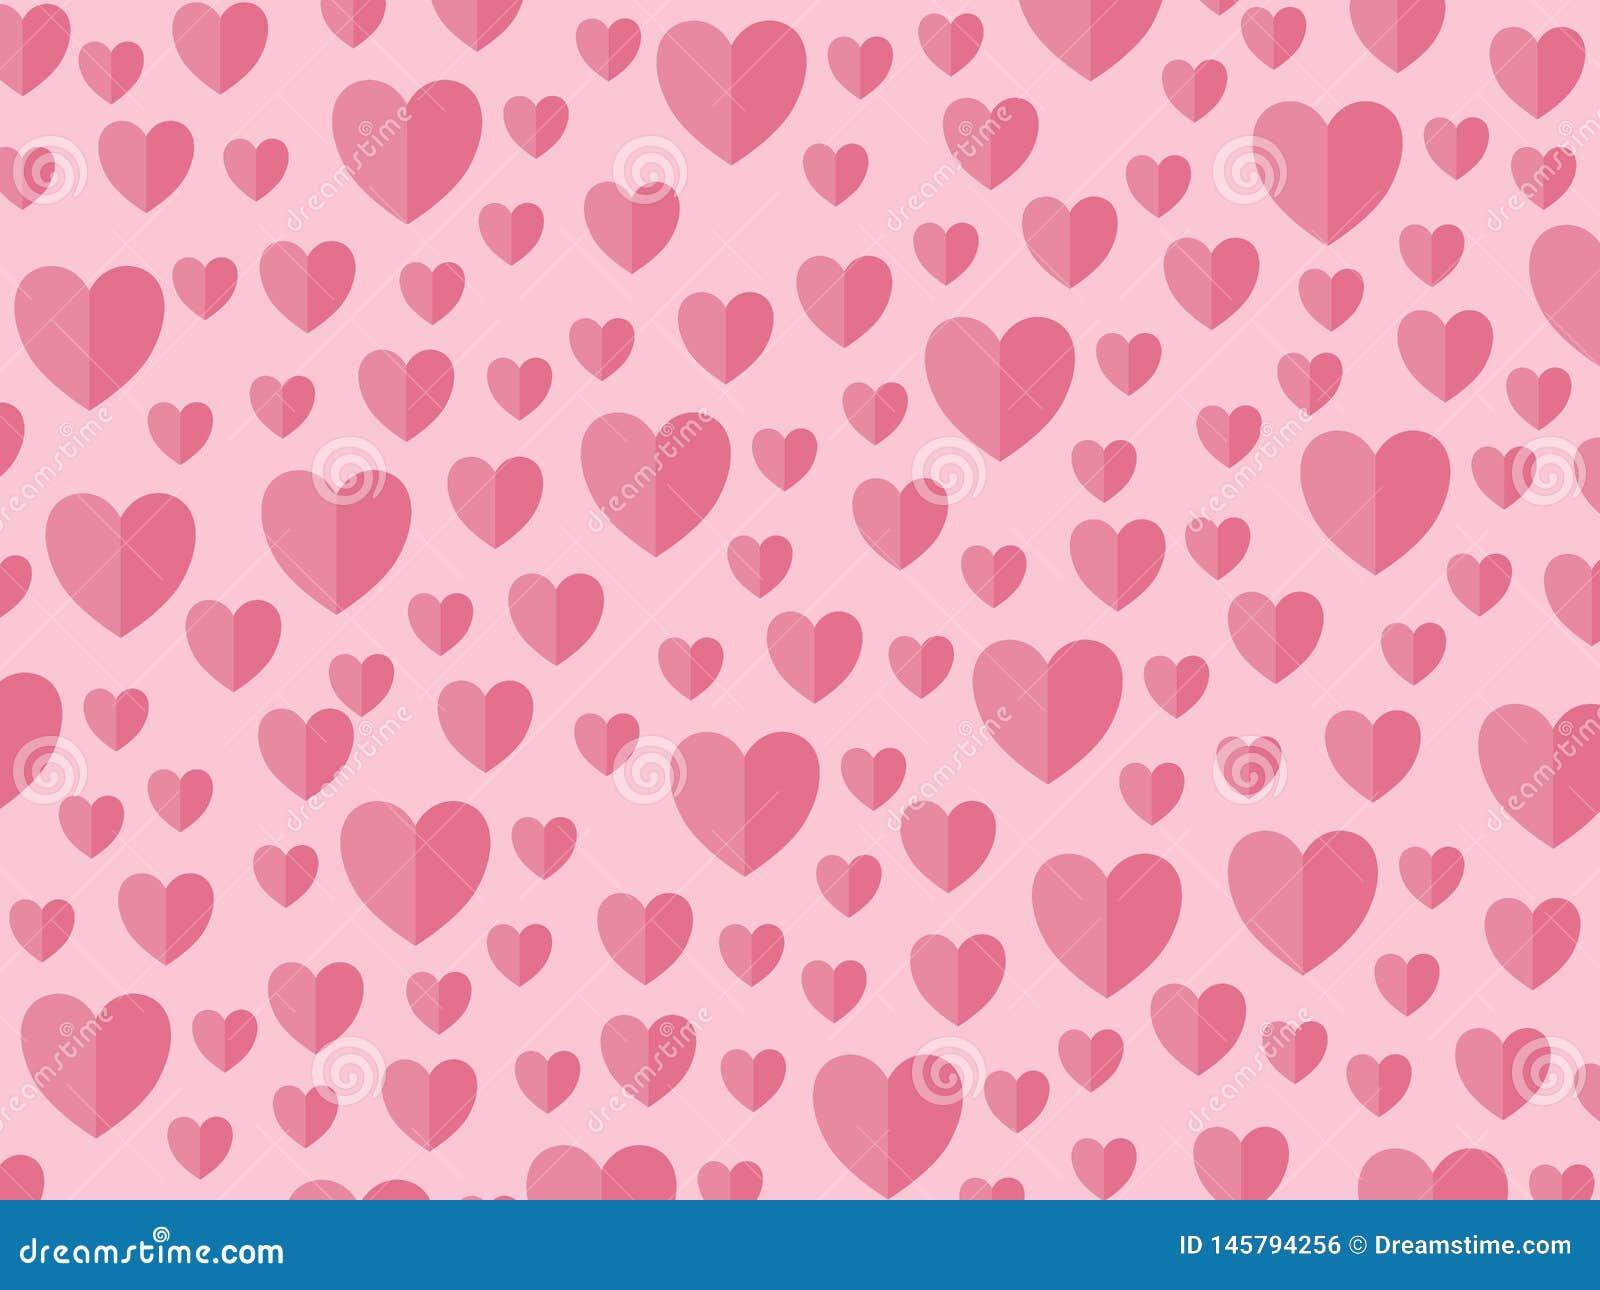 Сердца на розовый день матерей backround, Валентайн